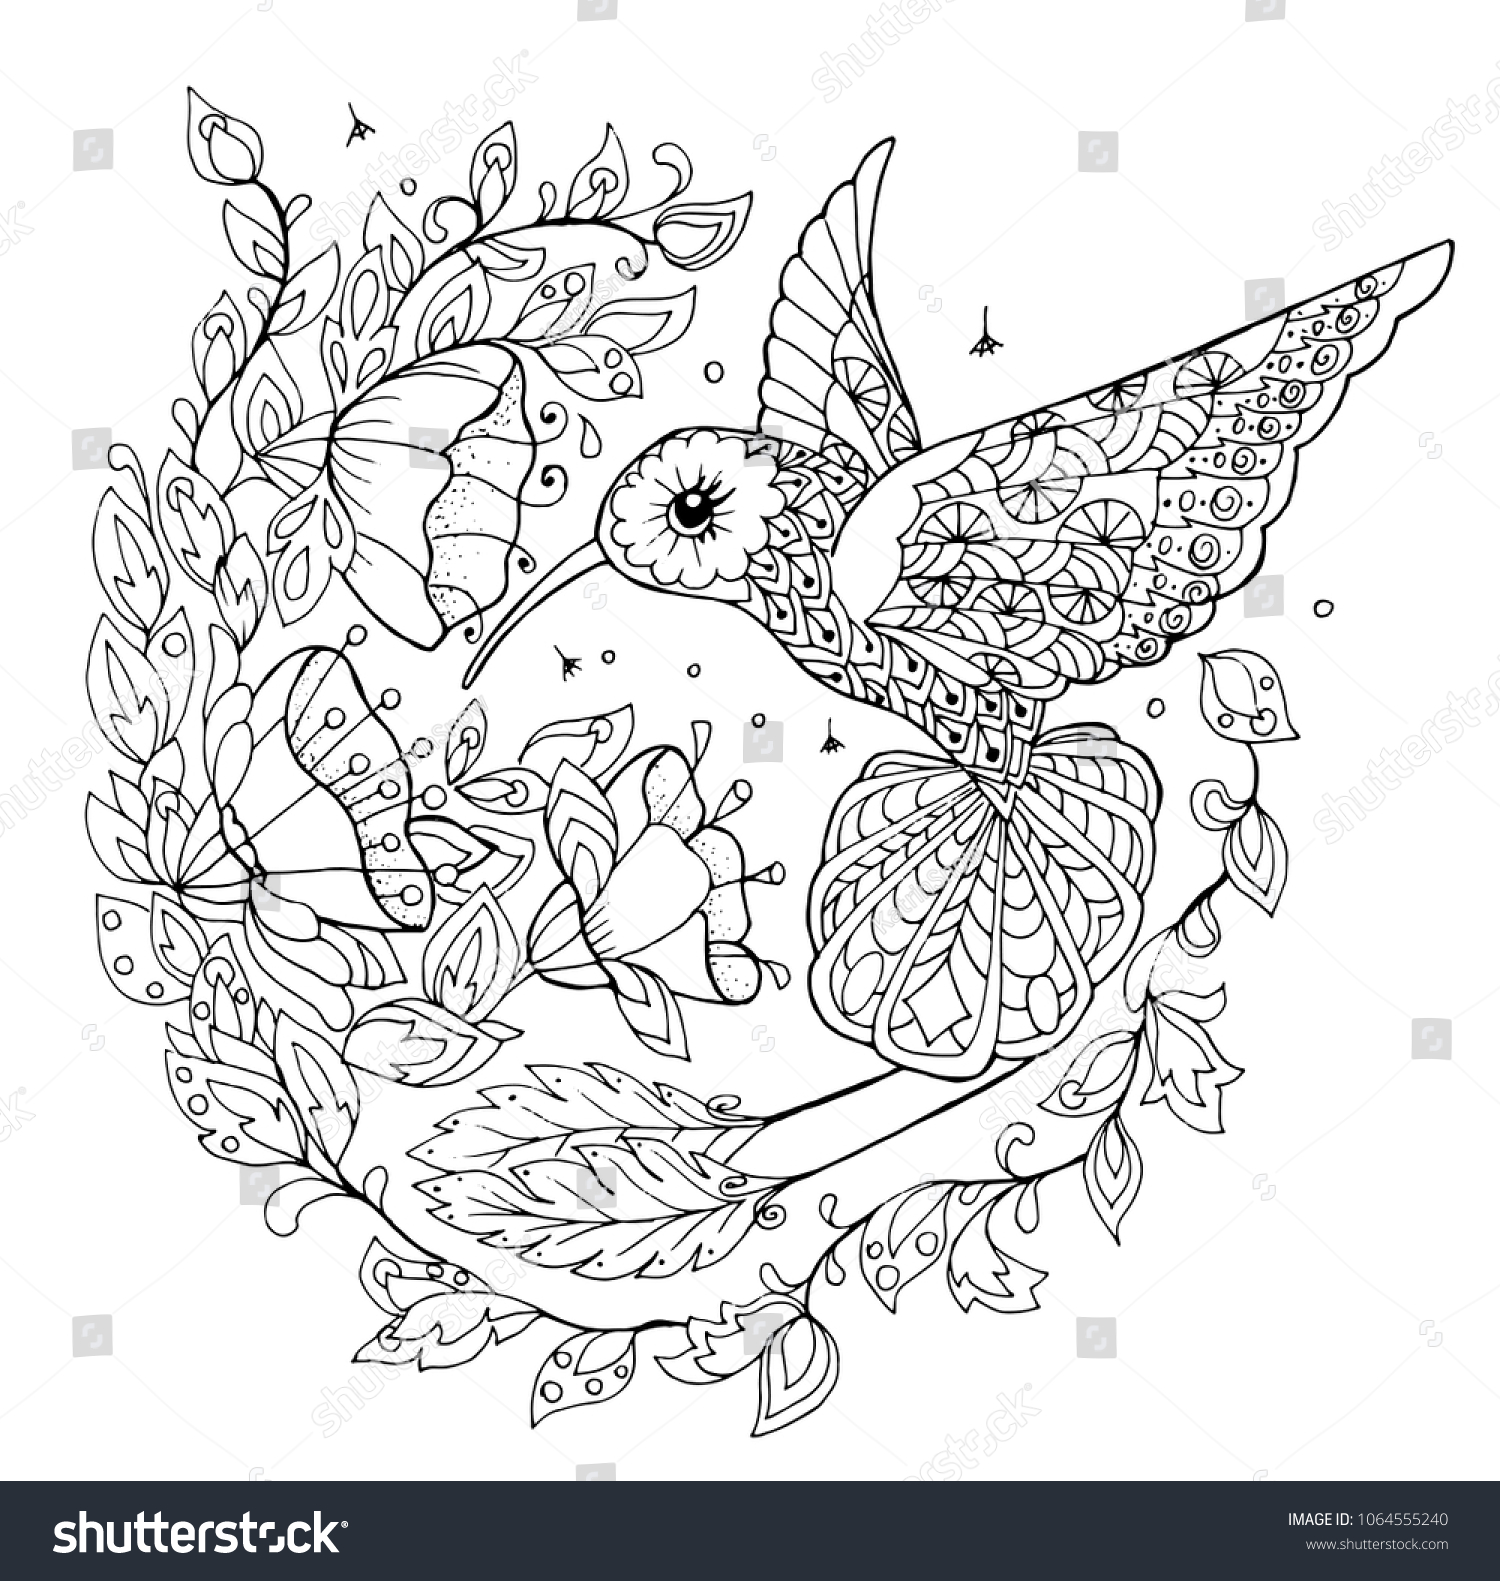 Hummingbird Coloring Book Stock Vector (Royalty Free) 1064555240